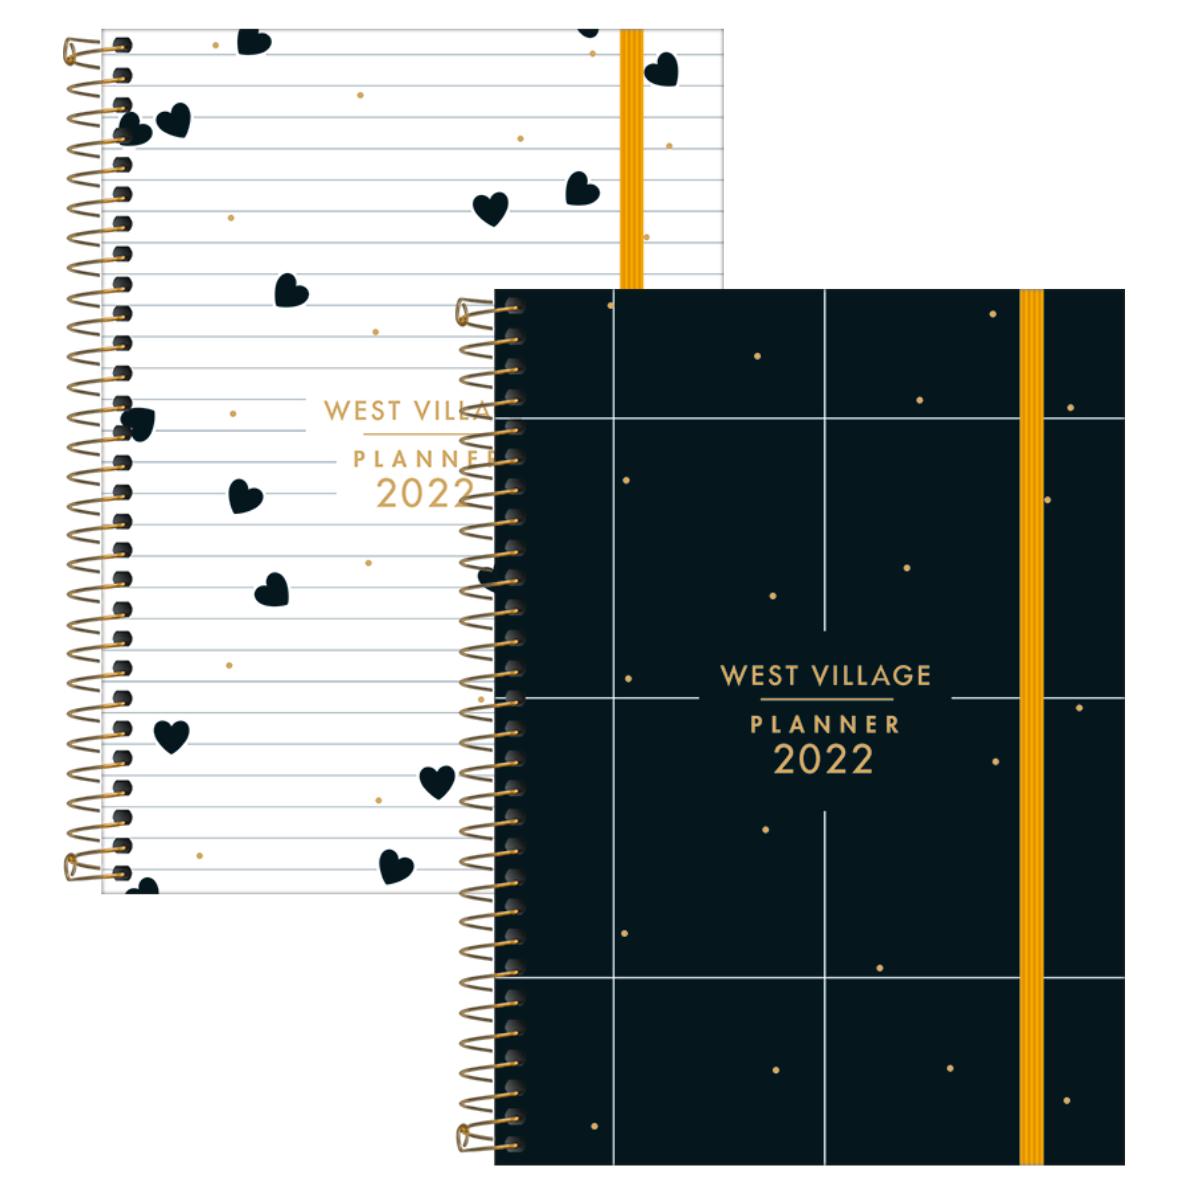 Agenda Planner Semanal 2022 West Village 80 folhas 2 capas diferentes - Tilibra